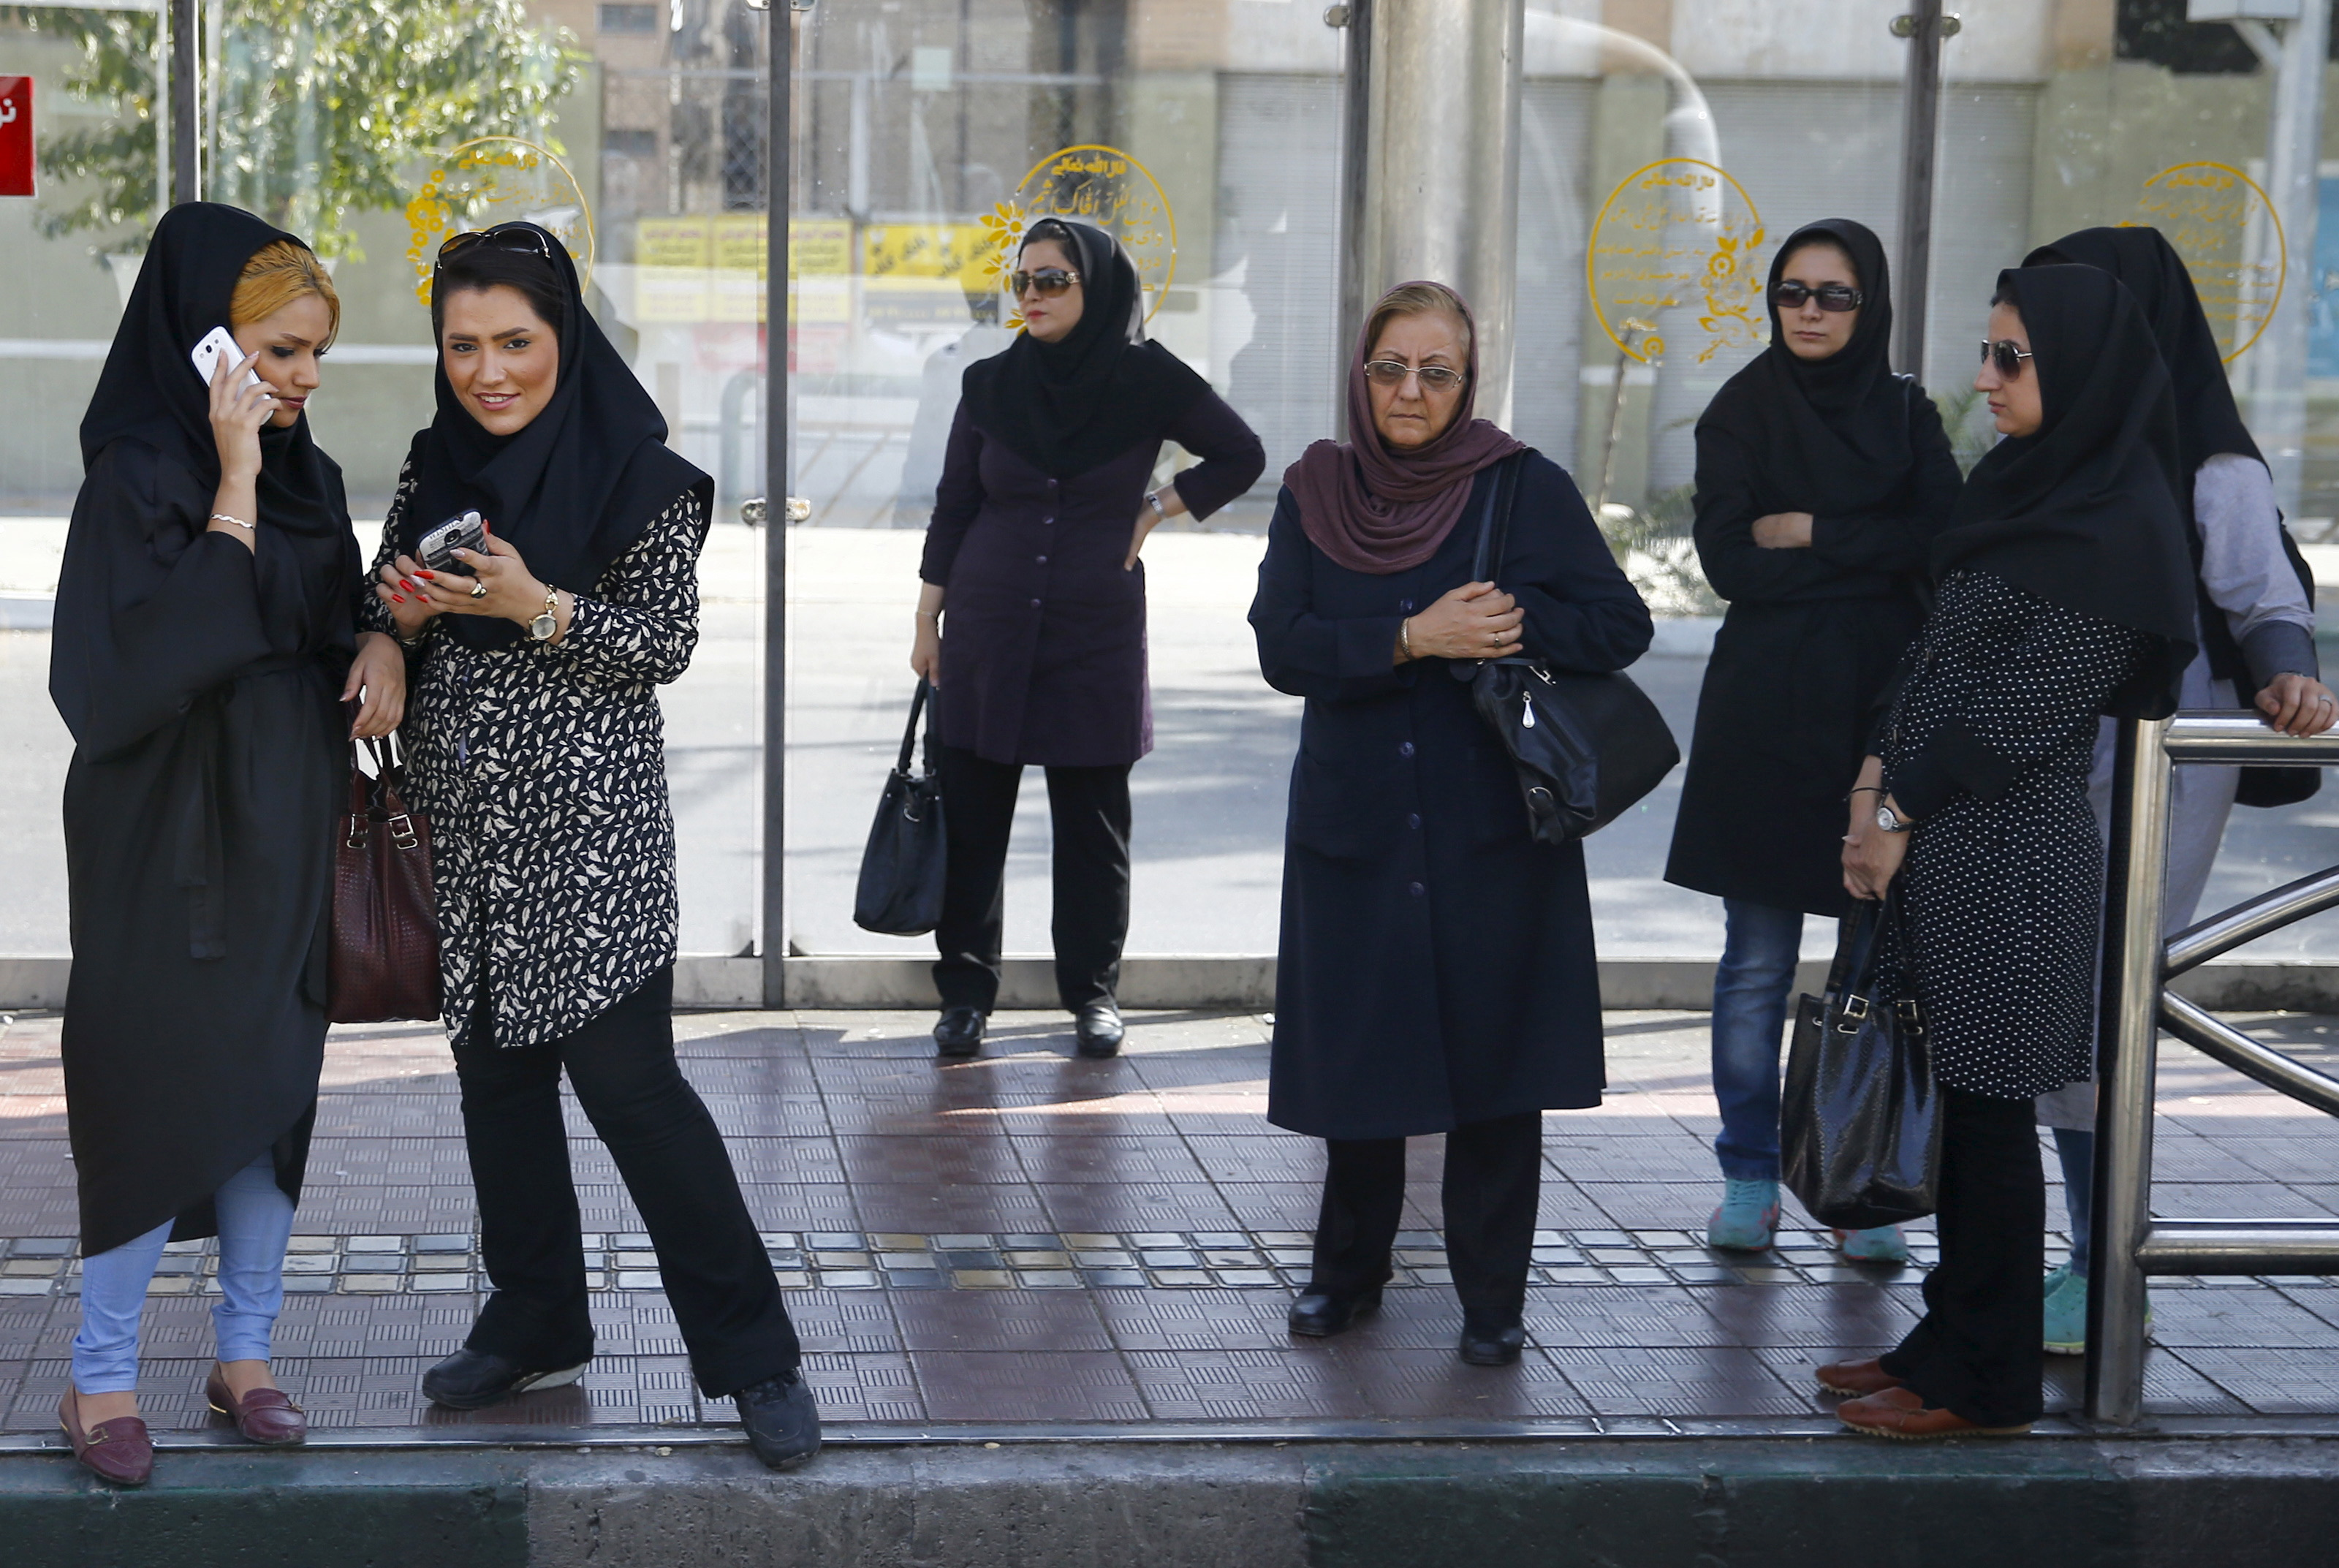 Transsexual in iran bbc